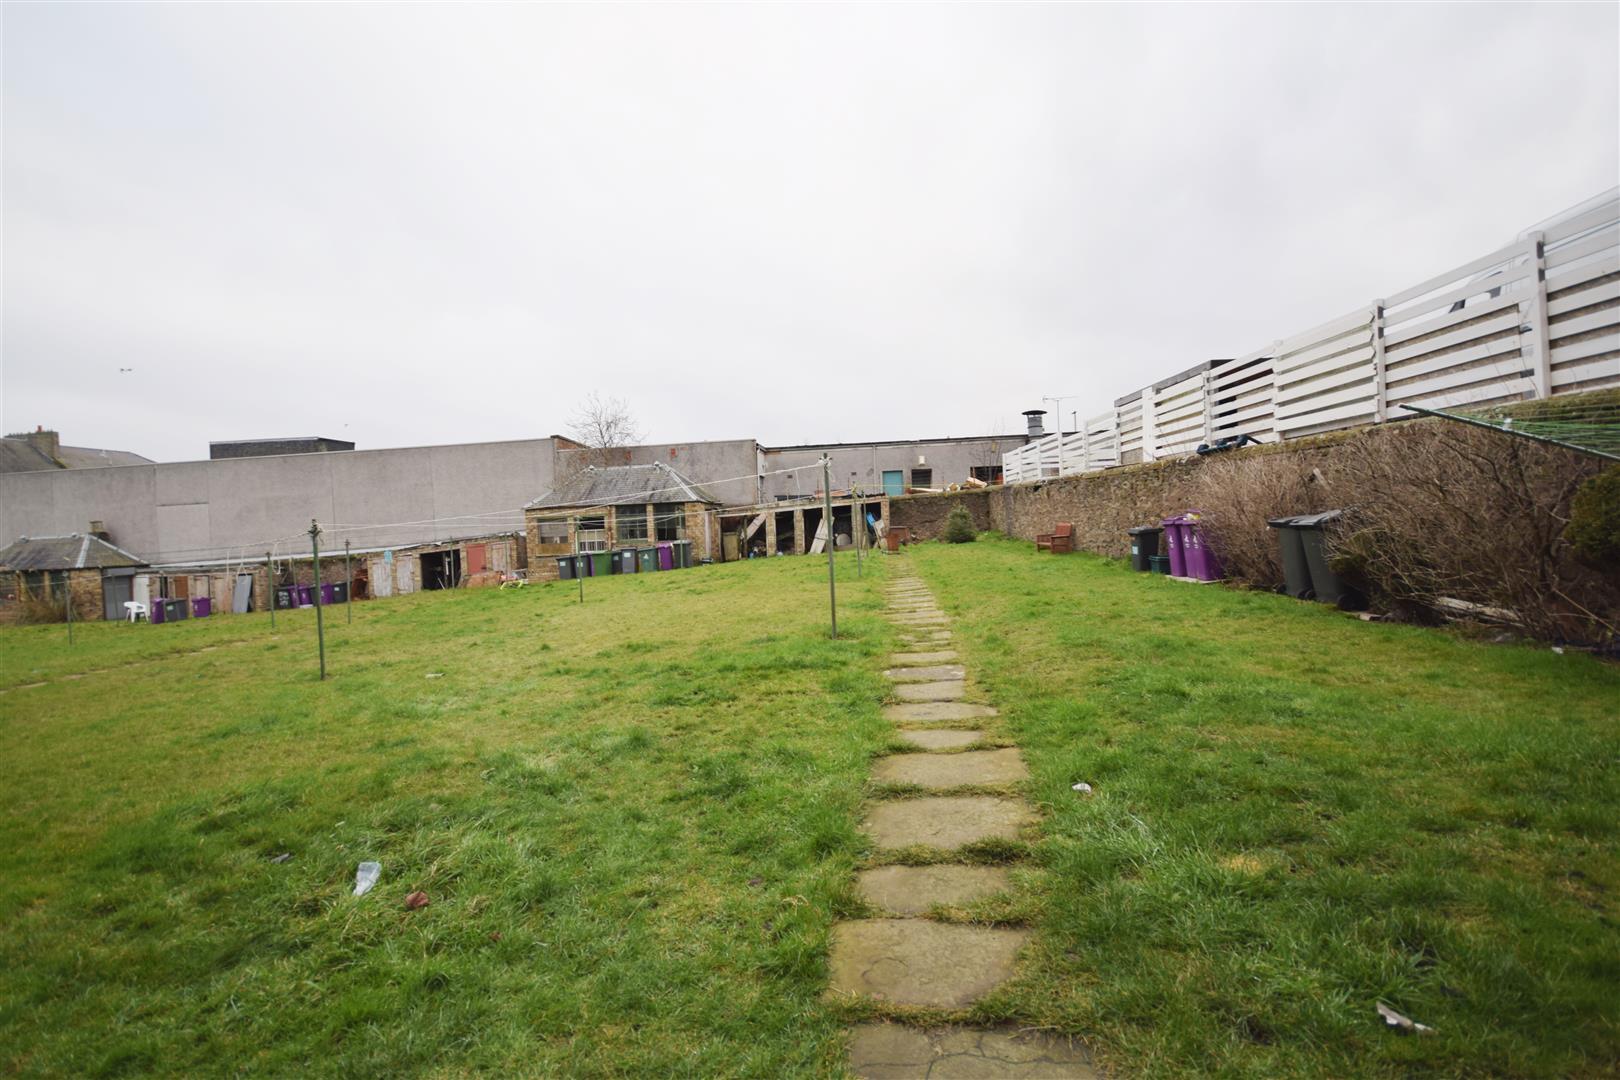 4F, Wellbank Place, Monifieth, Dundee, Angus, DD5 4BJ, UK